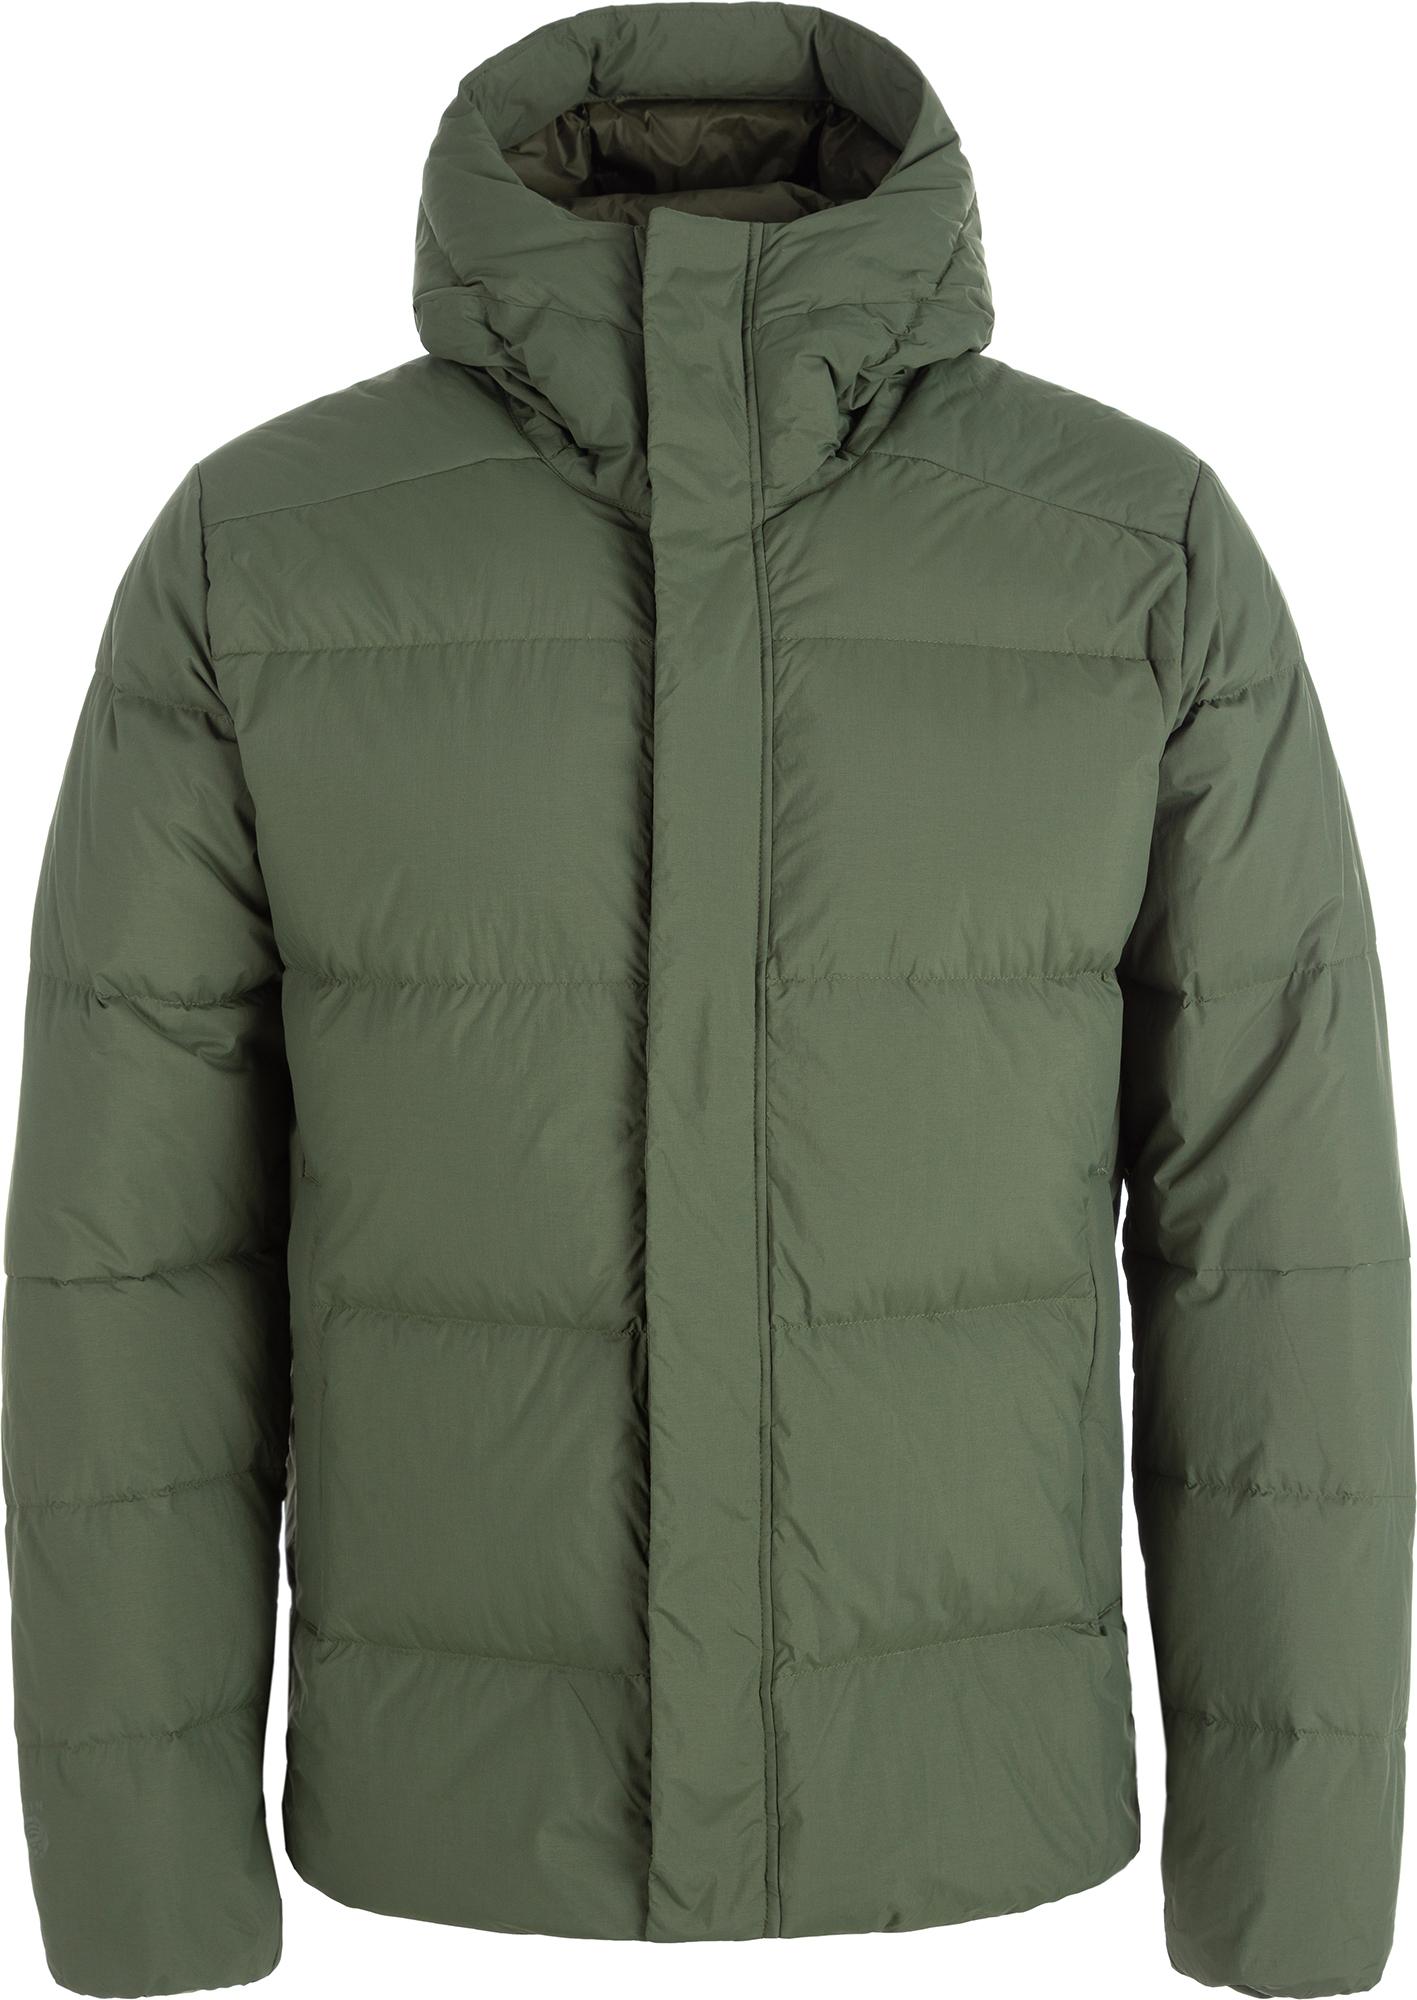 Mountain Hardwear Куртка пуховая мужская Mountain Hardwear Glacial Storm™, размер 56 mountain hardwear куртка утепленная мужская mountain hardwear radian размер 56